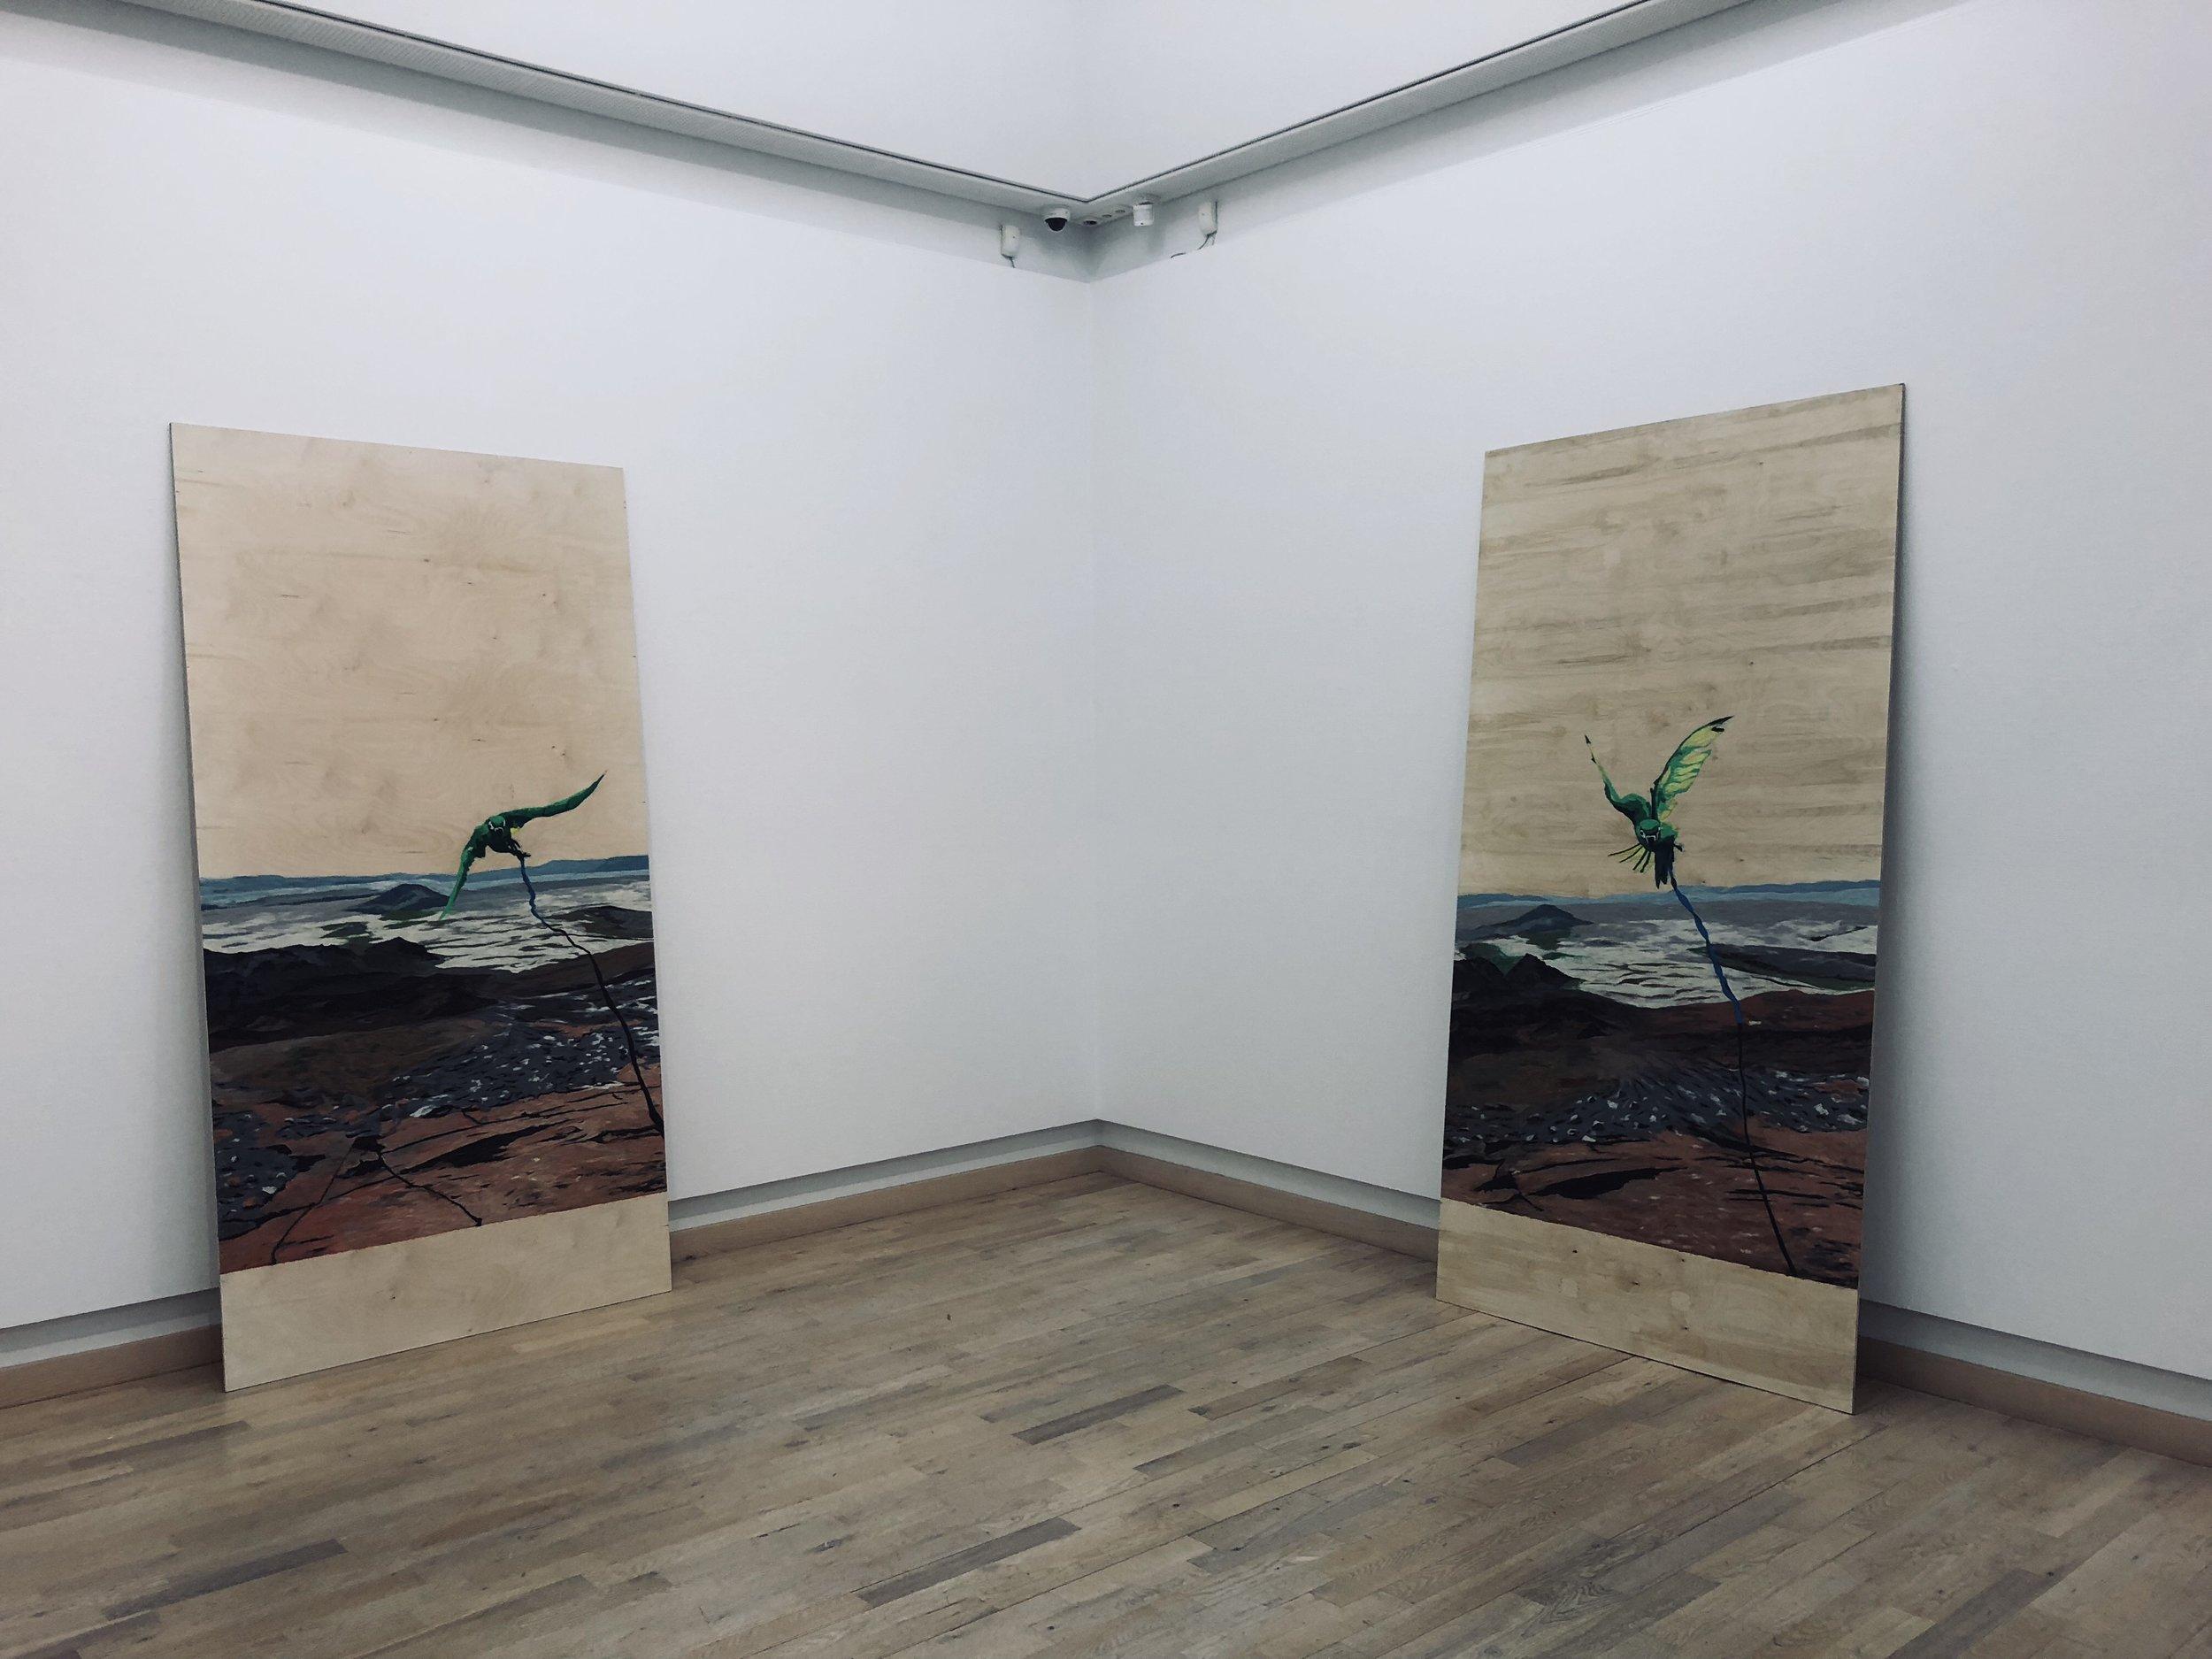 Icelandic Parroty - Gerðarsafn Kópavogur Art MuseumOctober 25, 2018 - January6, 2019